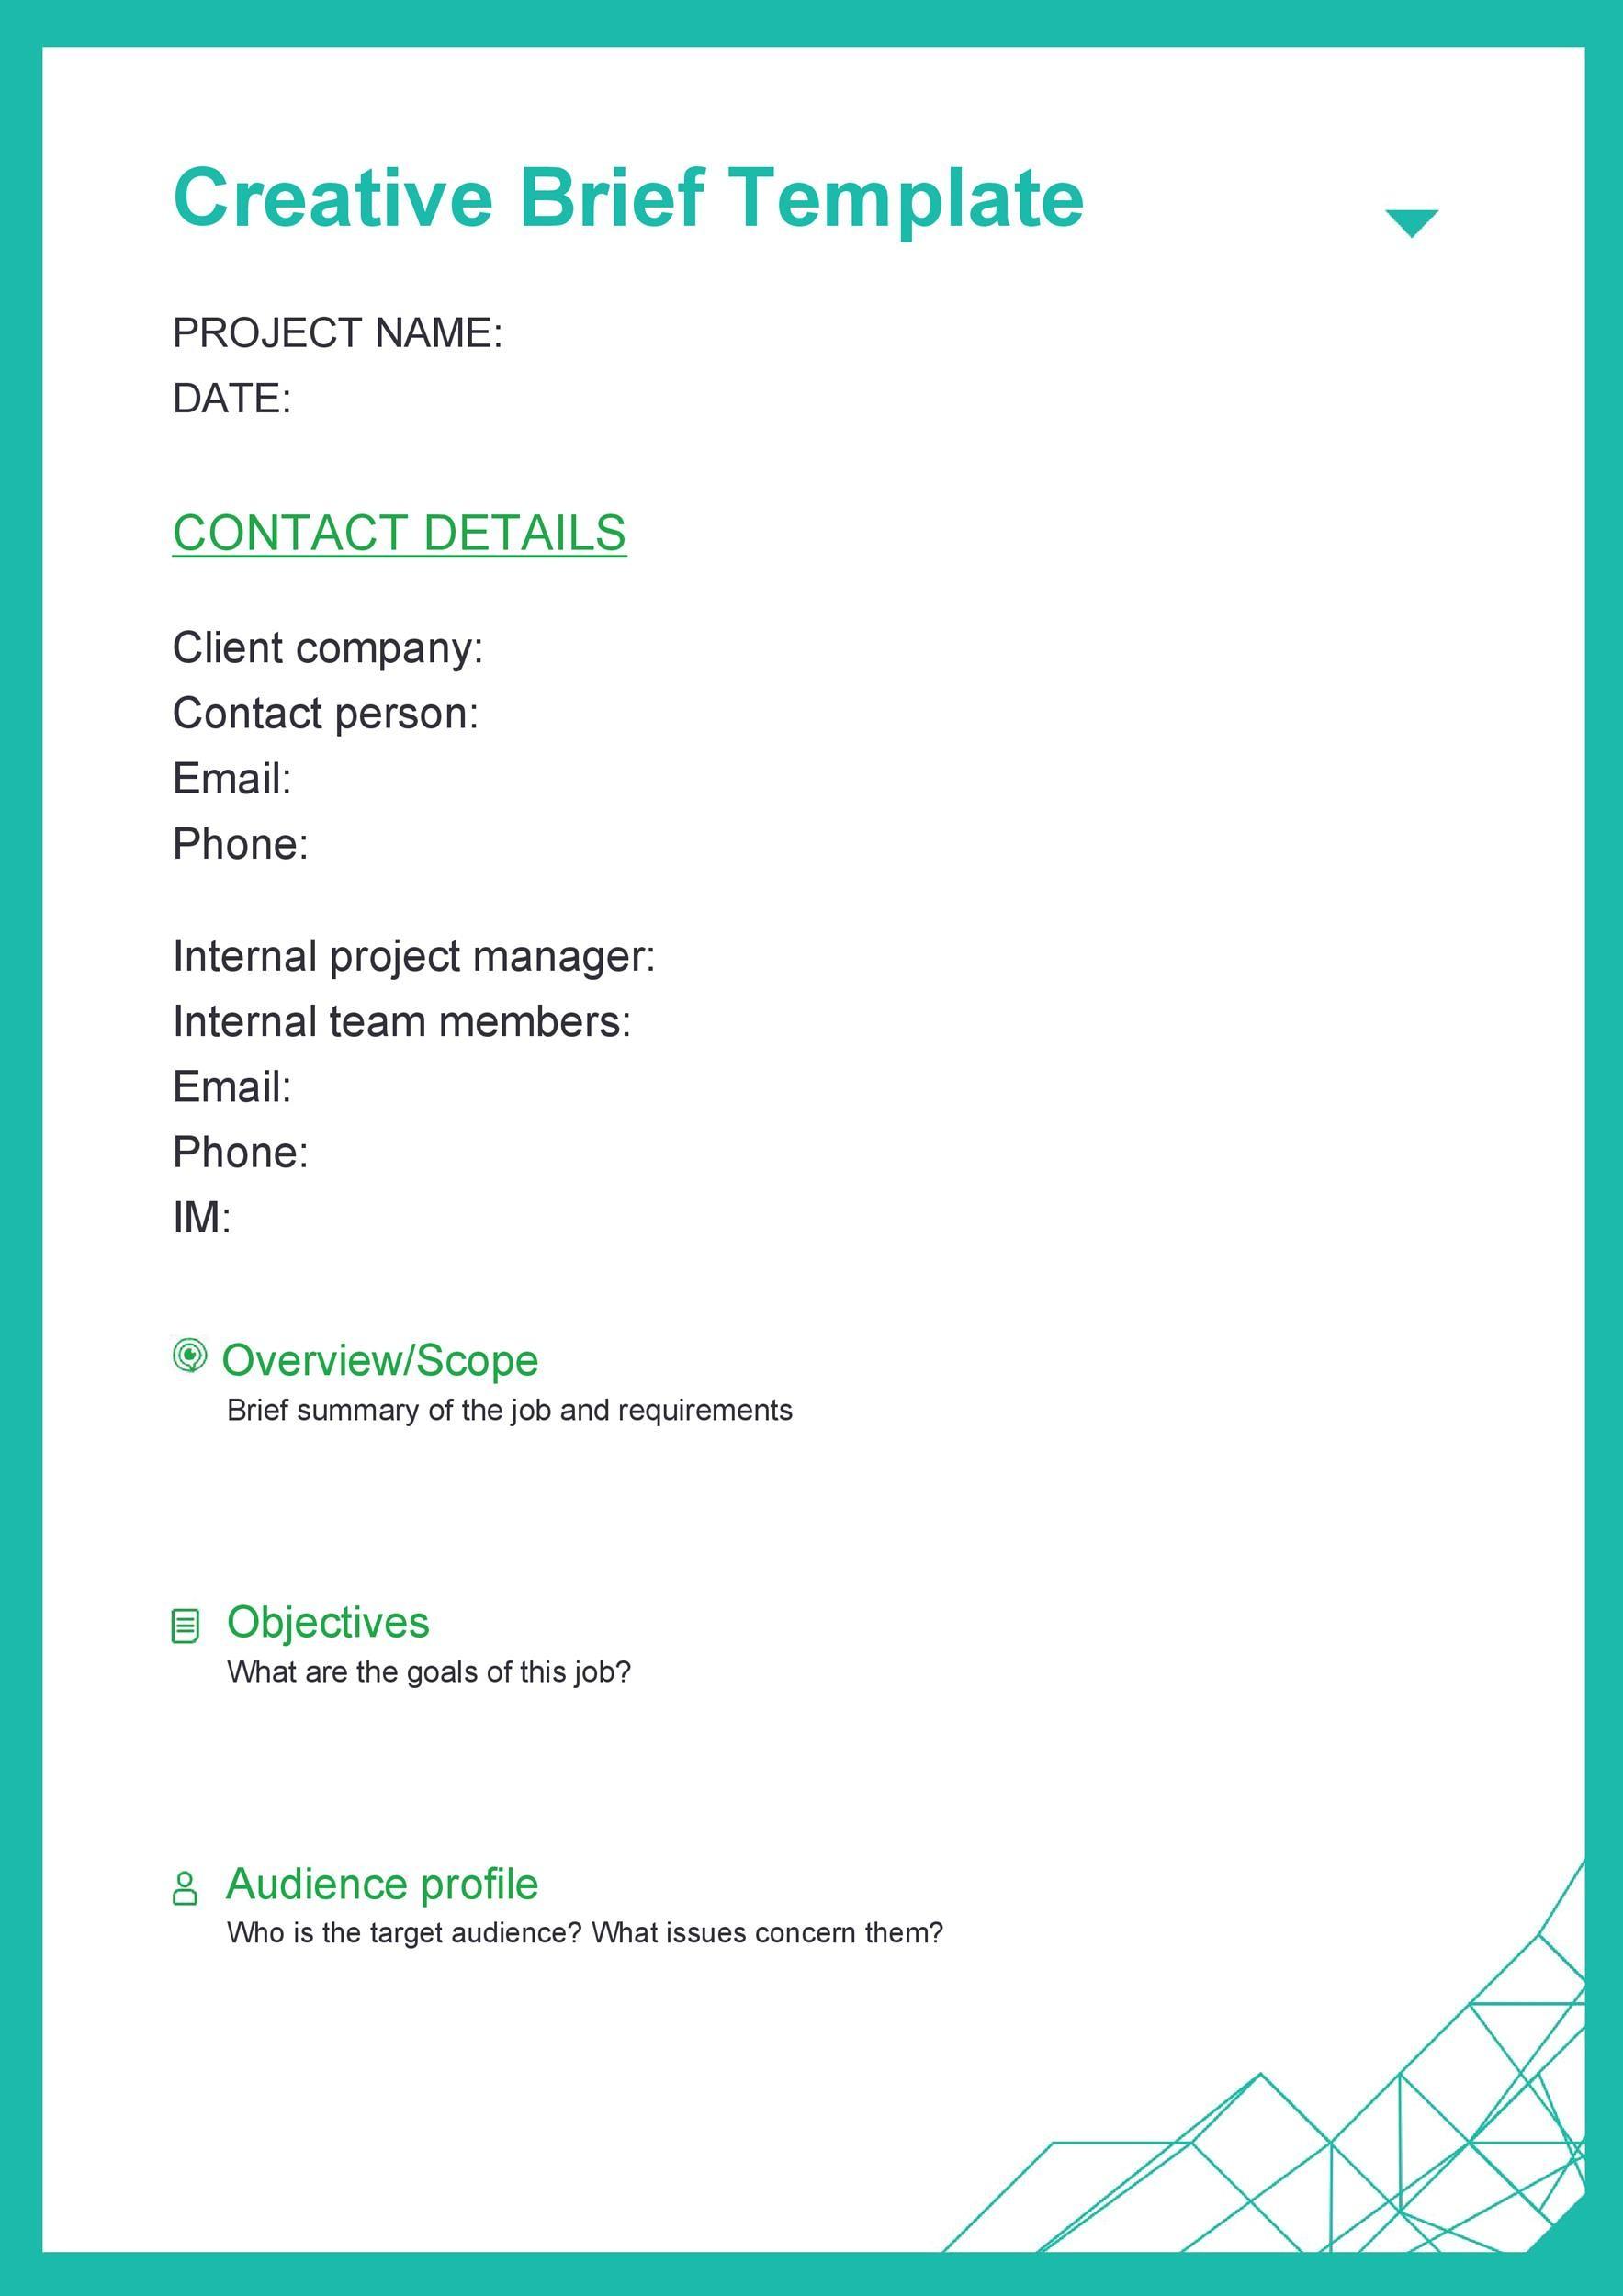 Free design brief template 08